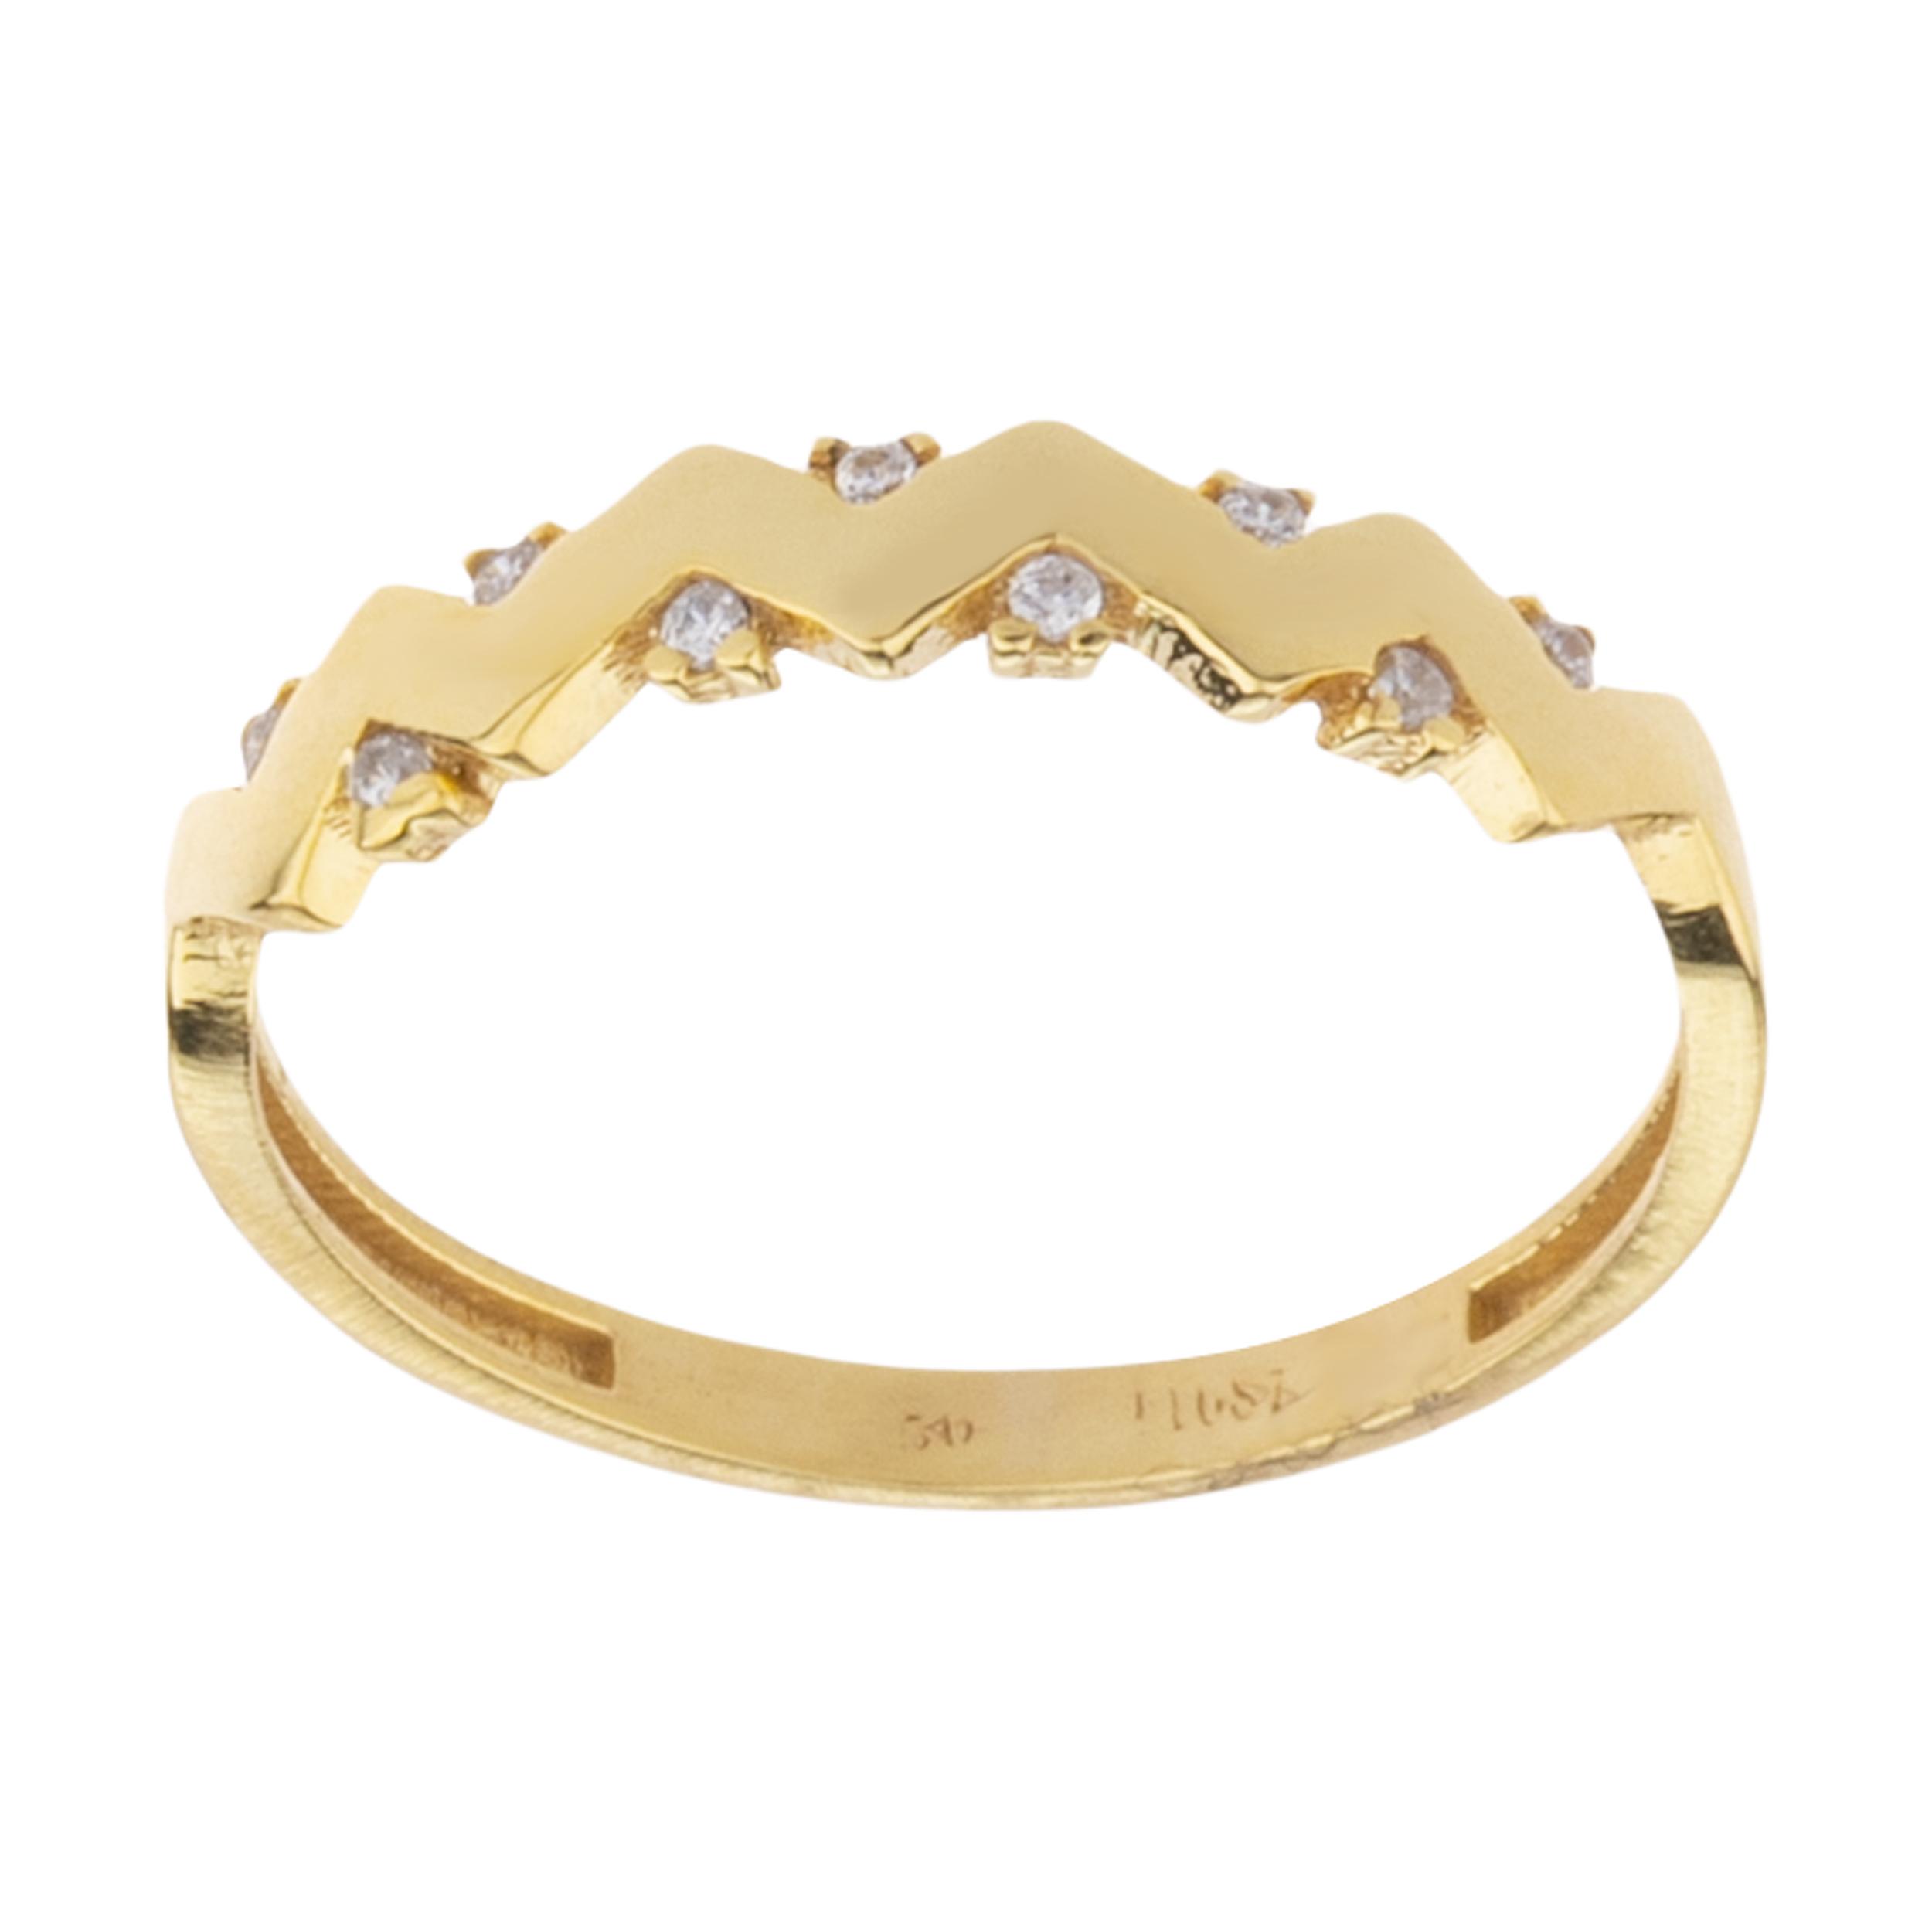 انگشتر طلا 18 عیار زنانه کانیار گالری کد AT27